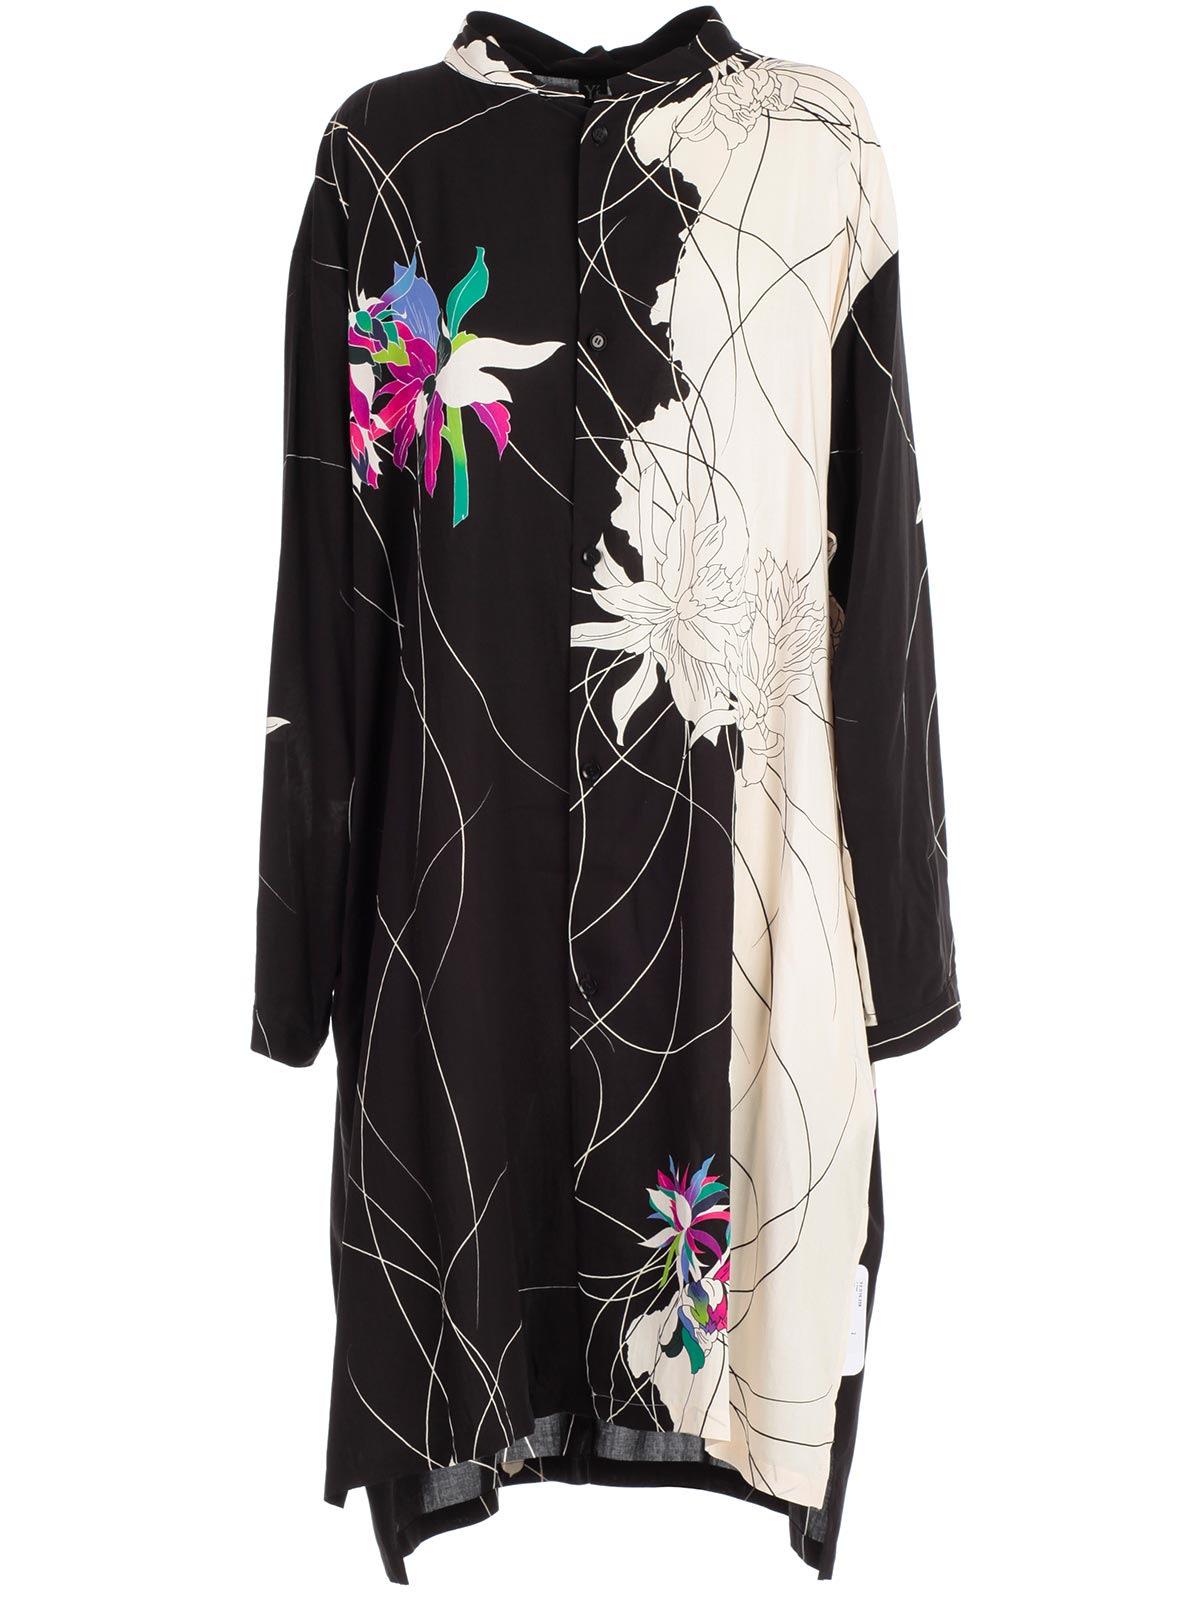 Ys Floral Print Oversized Dress